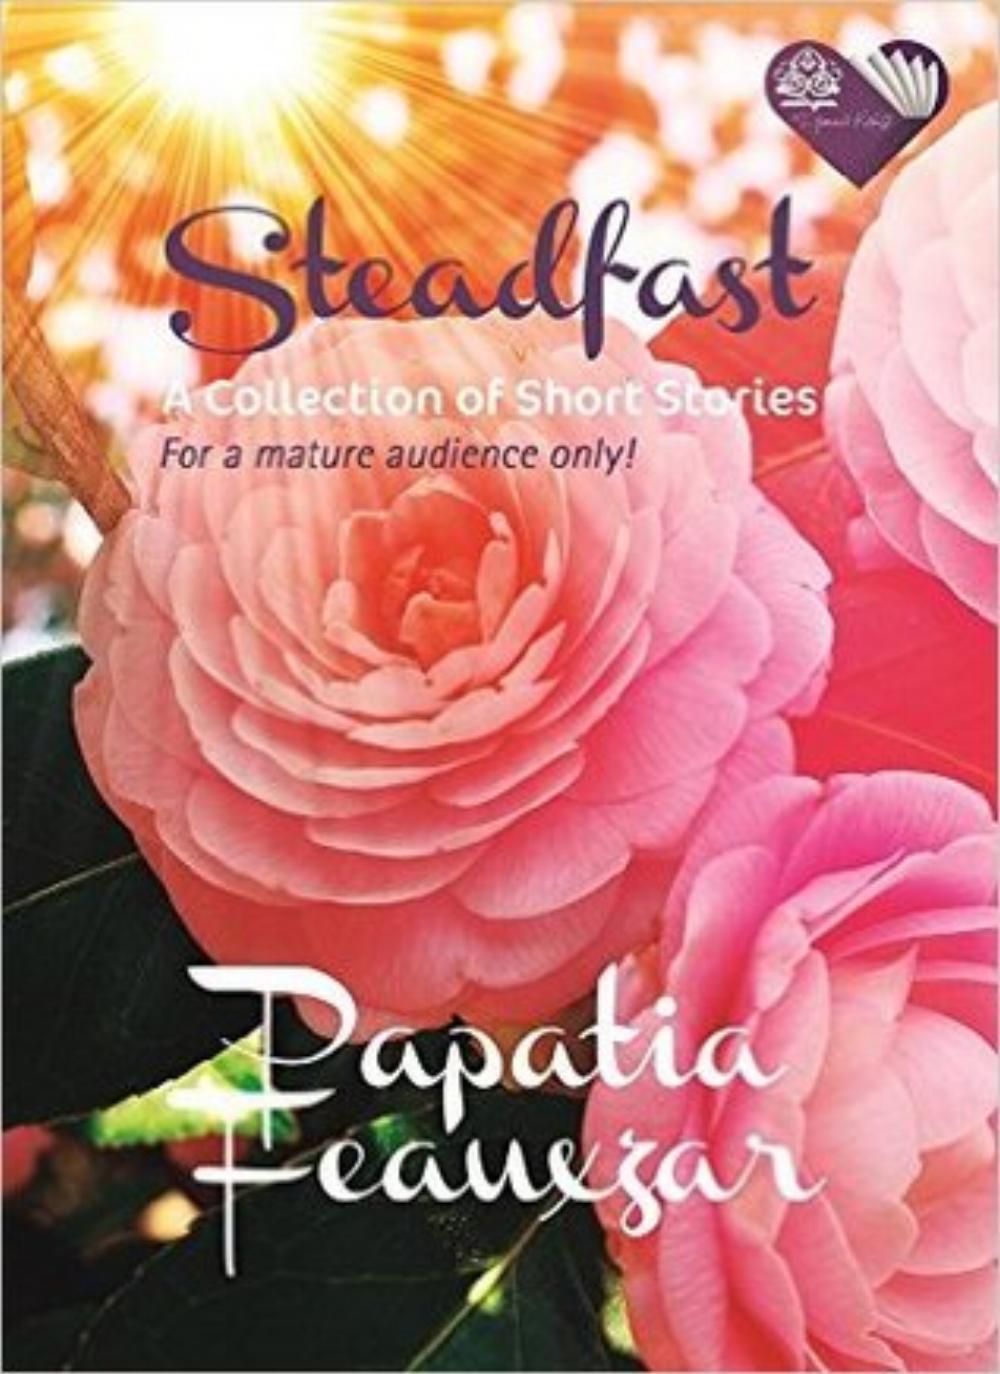 steadfast ebook.jpg